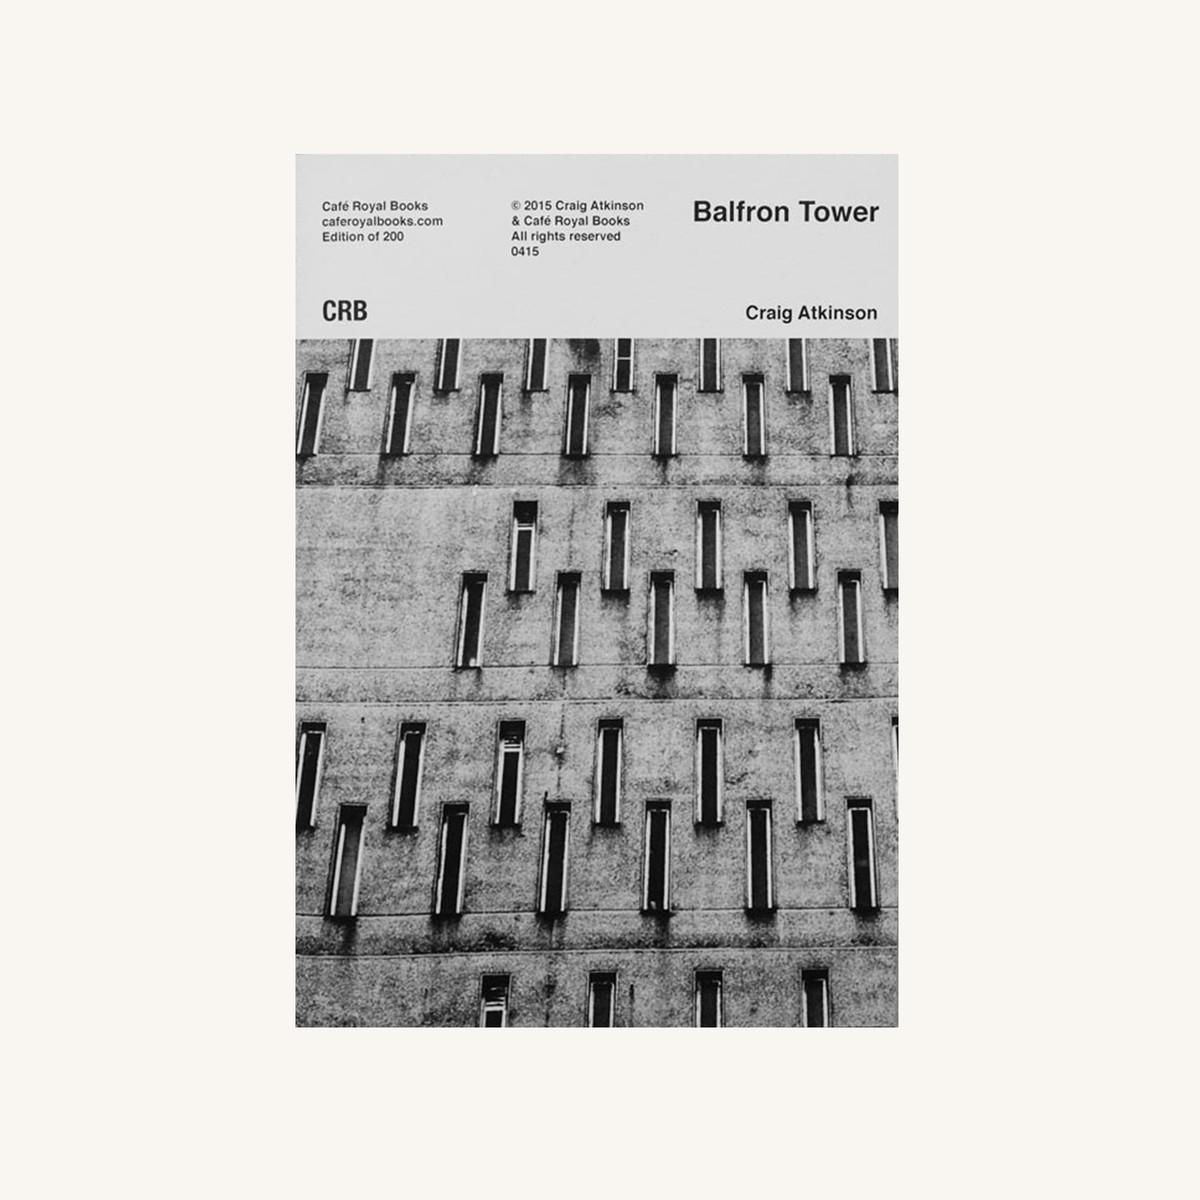 Photo of Balfron Tower Photozine